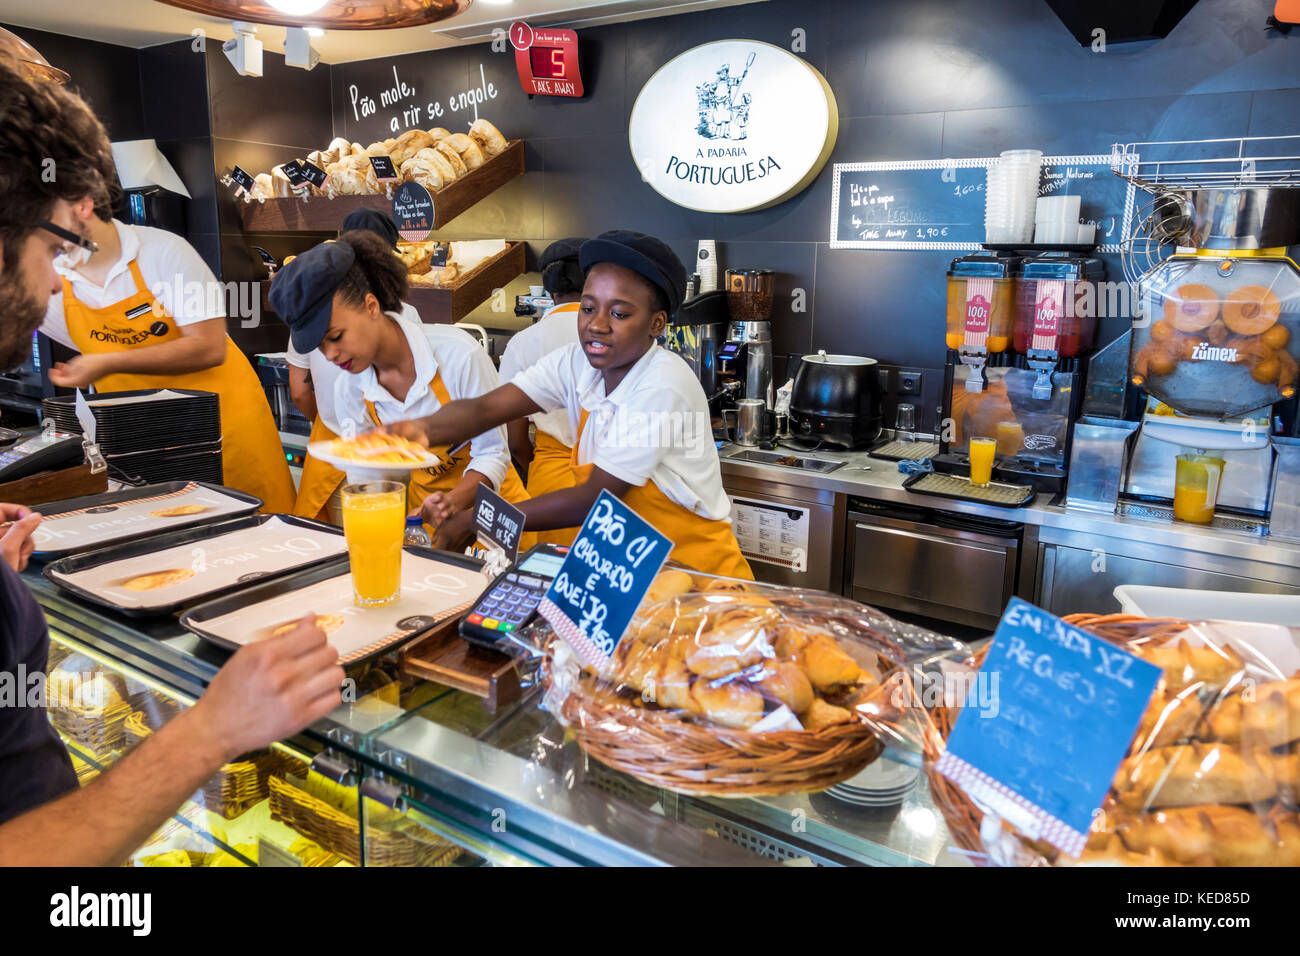 Lisbon Portugal Marquis of Pombal Square Padaria Portuguesa bakery cafe counter server customer bread Black woman - Stock Image